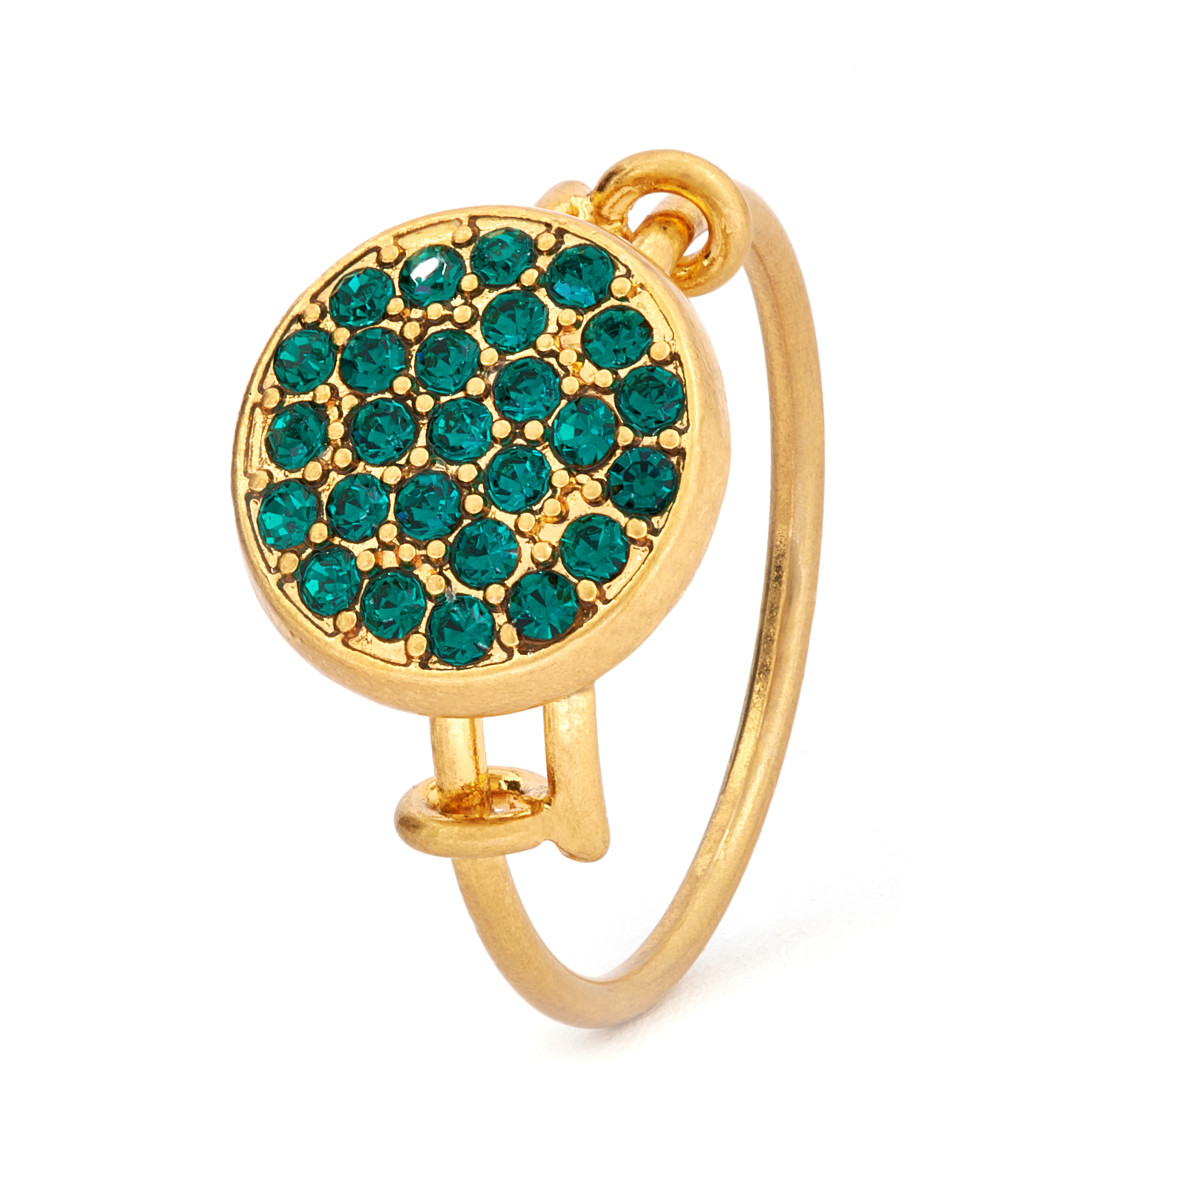 Chrysalis rings